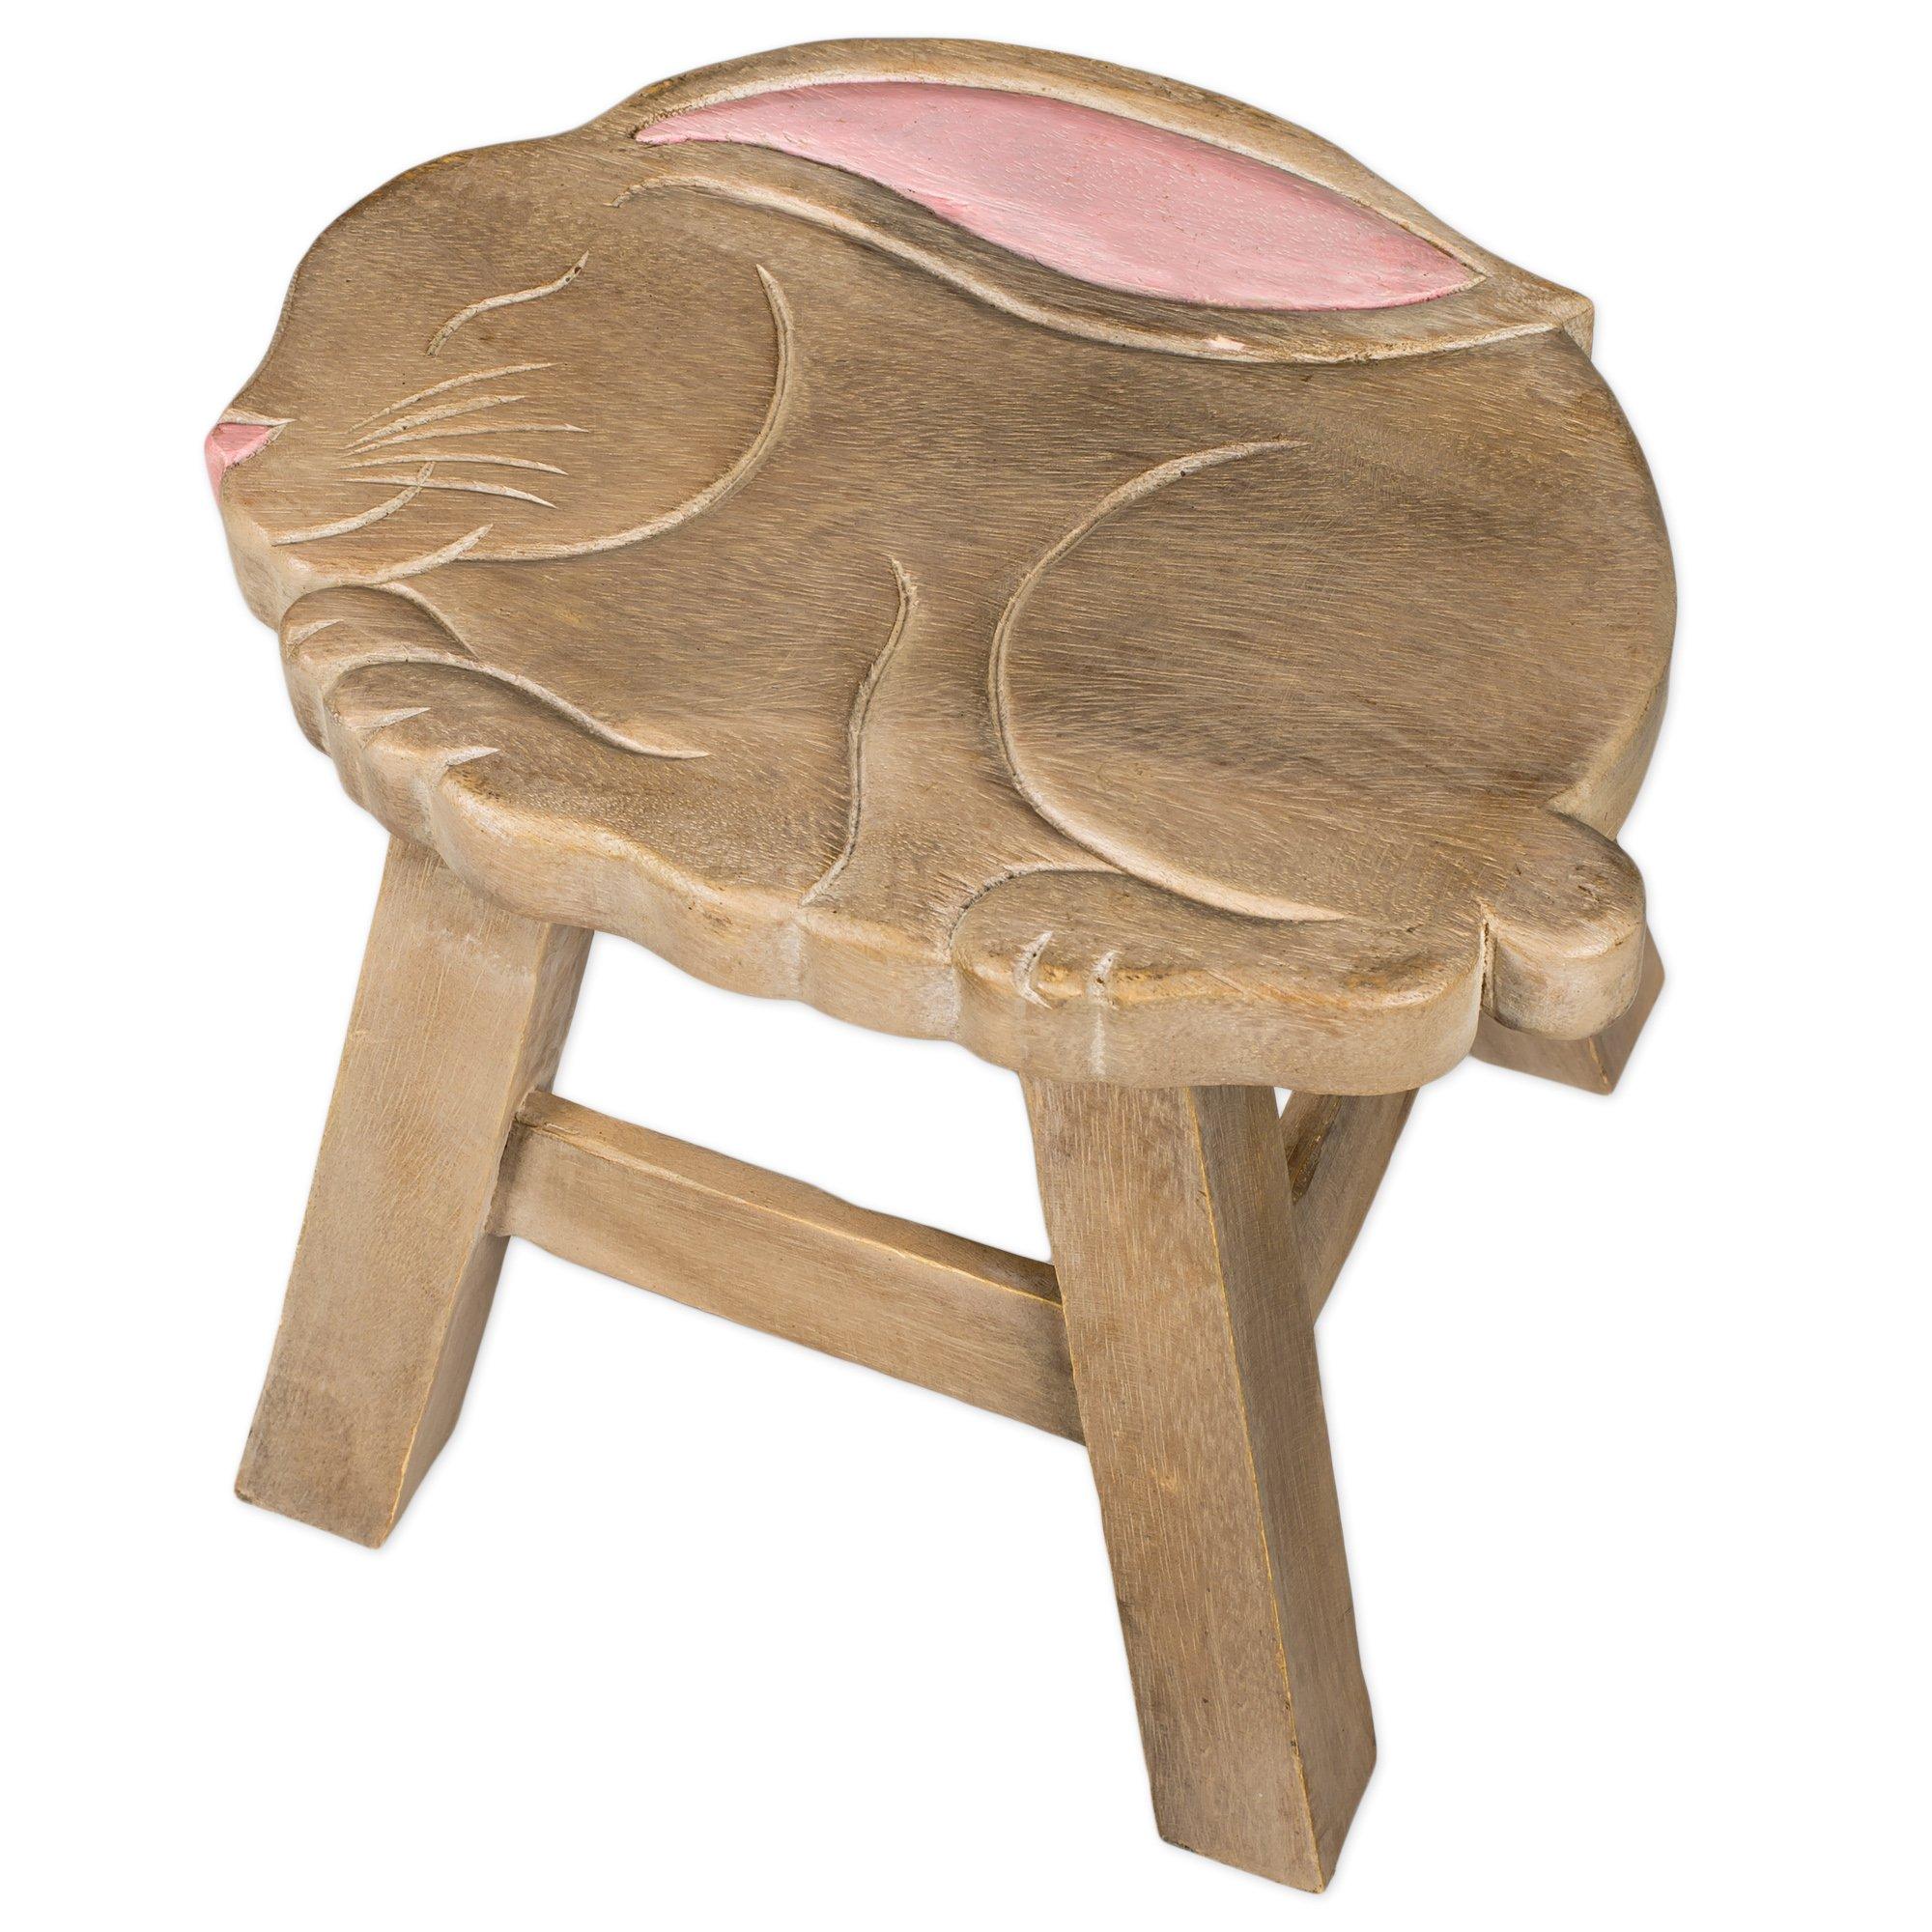 Bunny Design Hand Carved Acacia Hardwood Decorative Short Stool